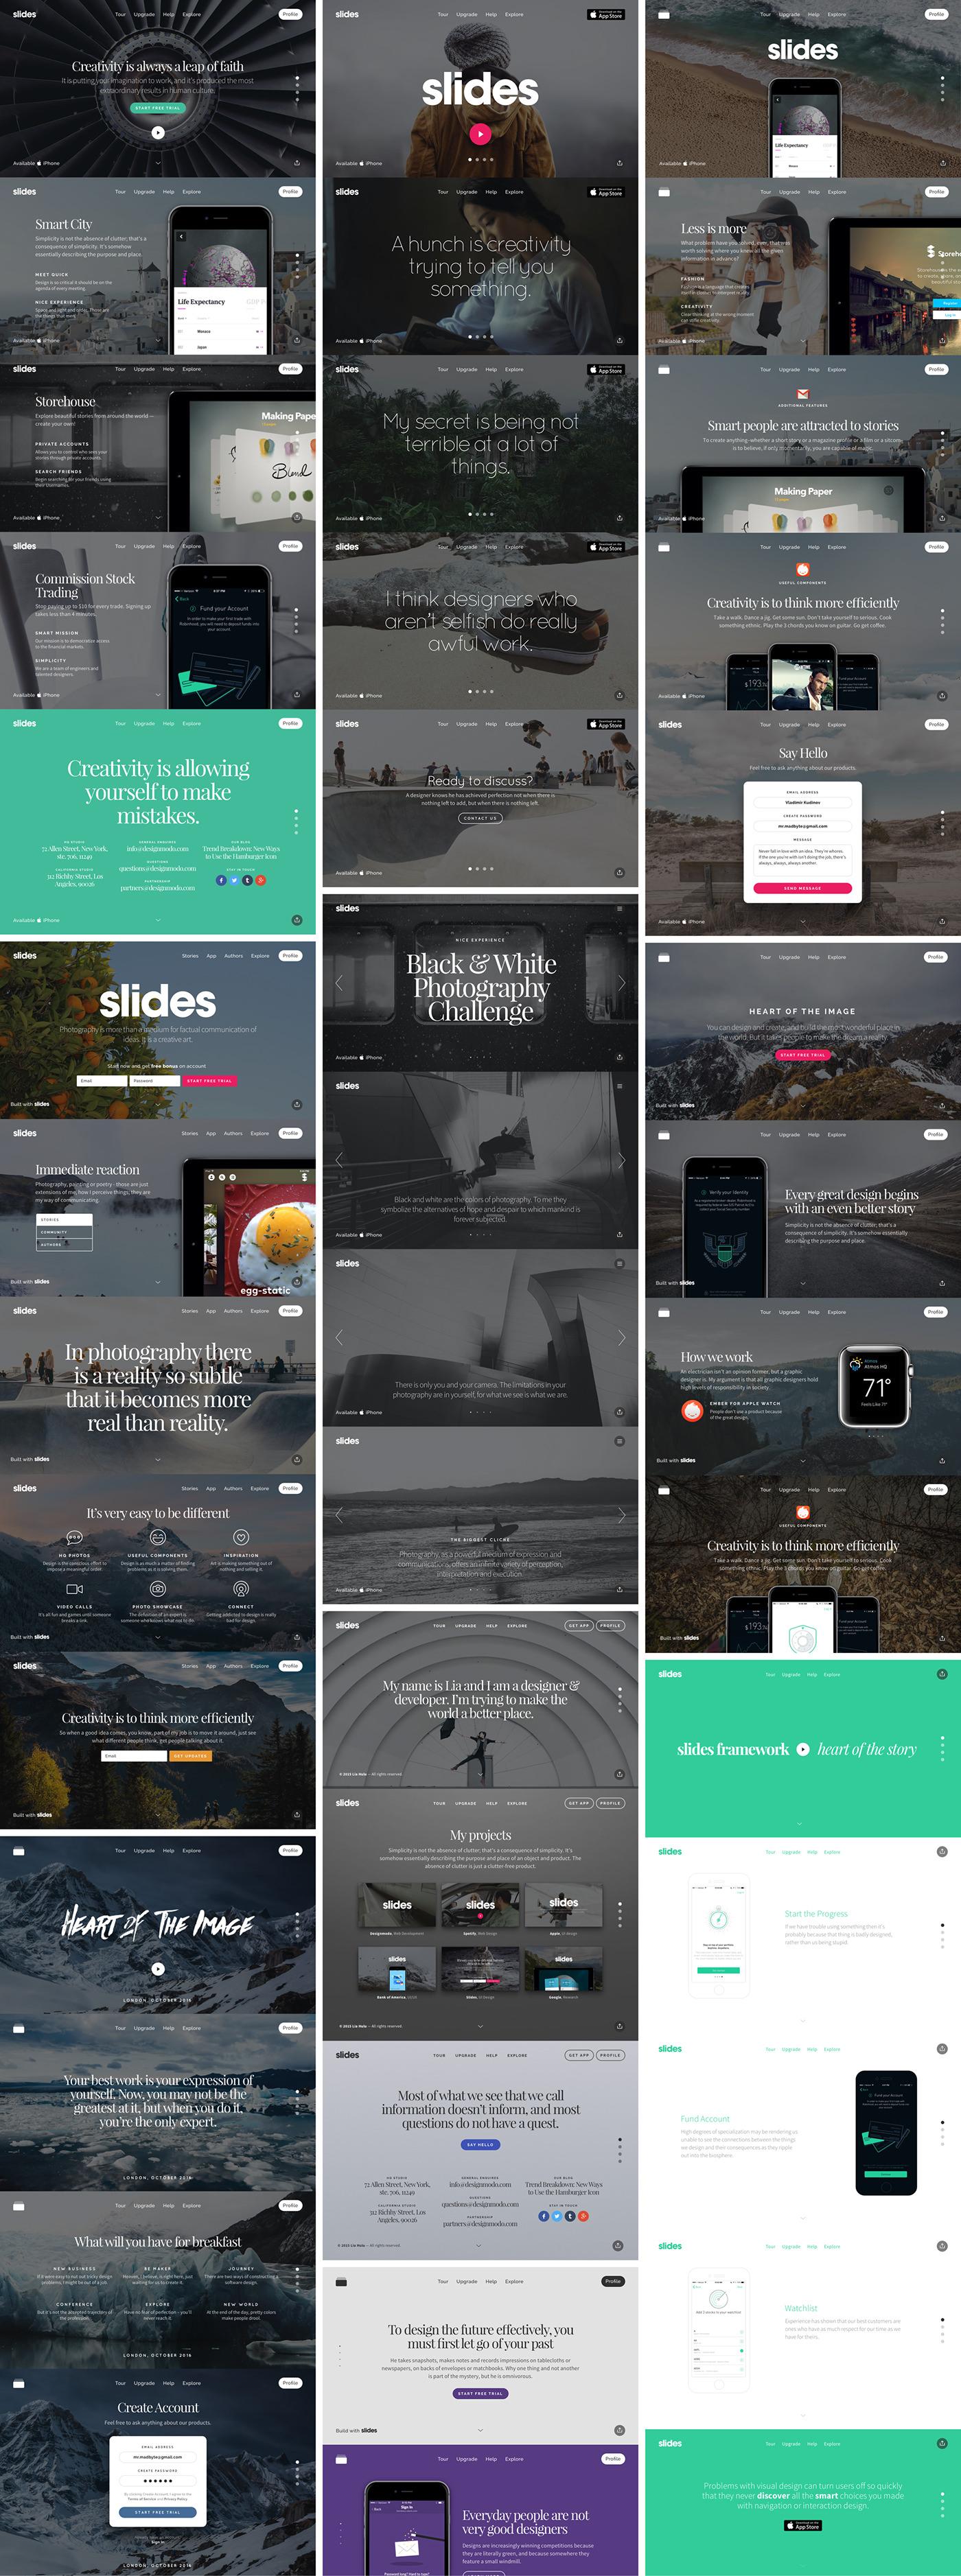 Web presentations